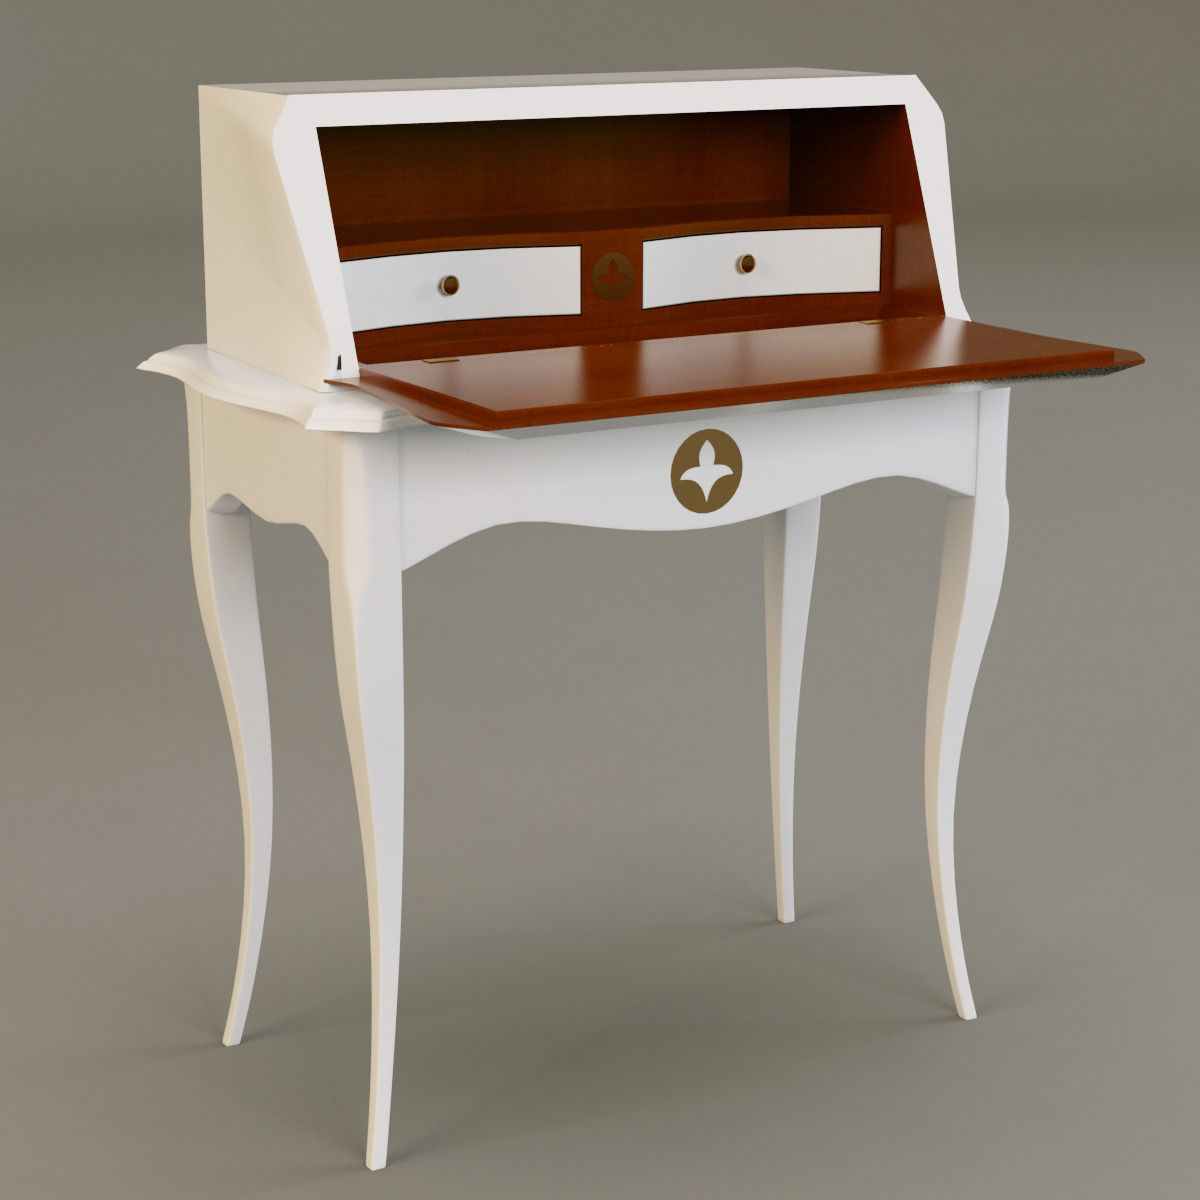 grange pompadour bureau 3d model max obj 3ds fbx mtl. Black Bedroom Furniture Sets. Home Design Ideas